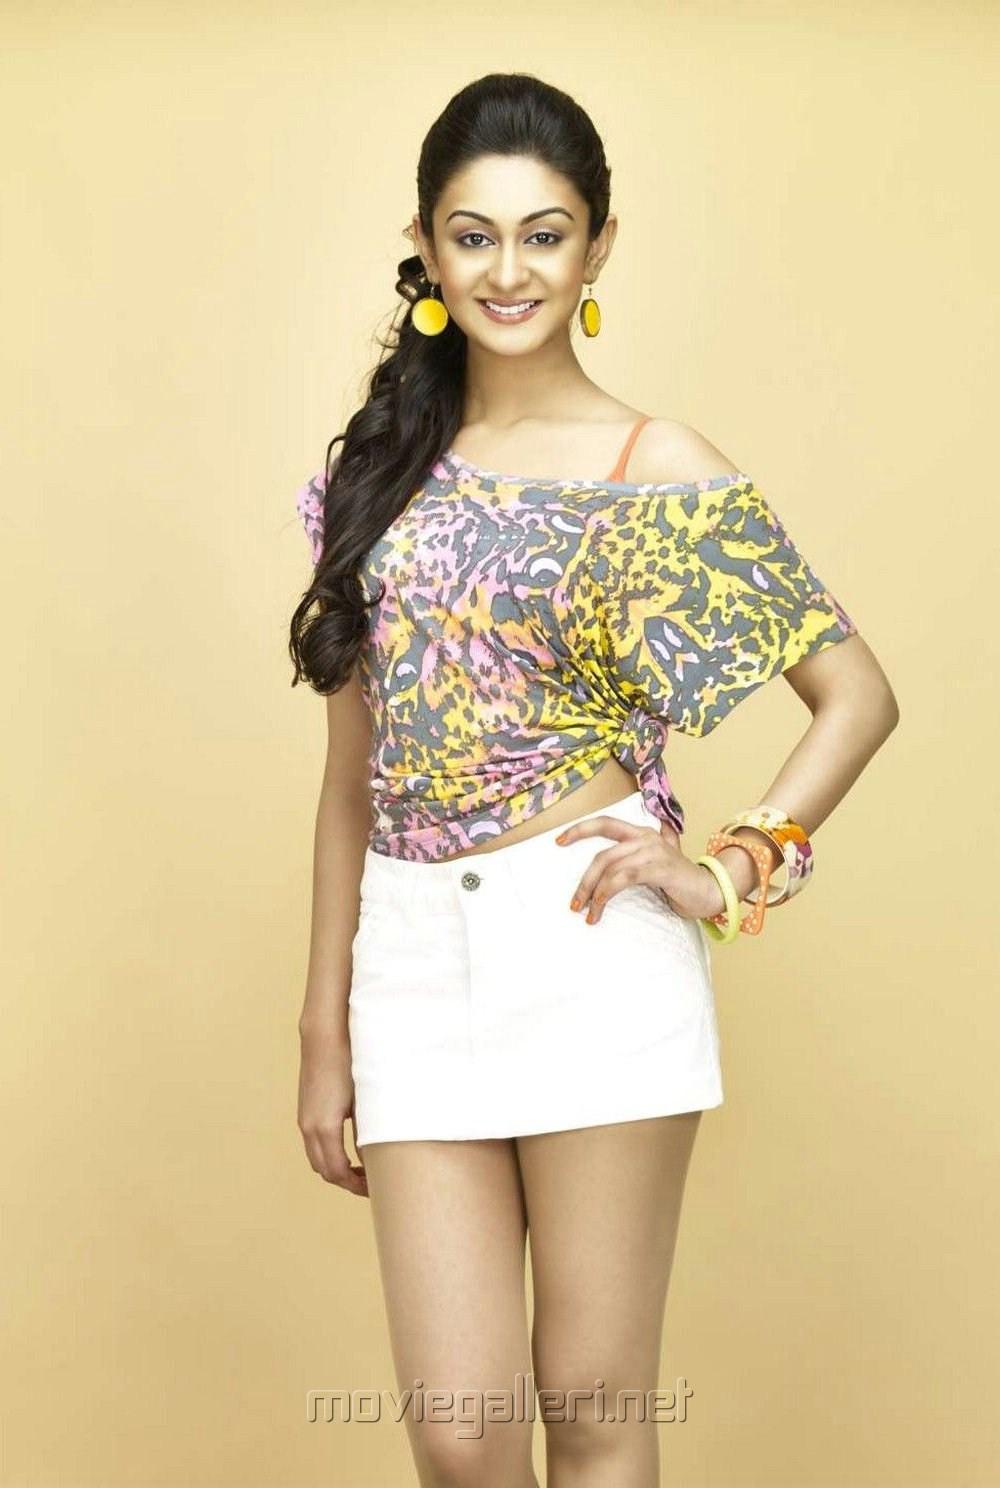 Actress Aishwarya Arjun Hot Photoshoot Stills